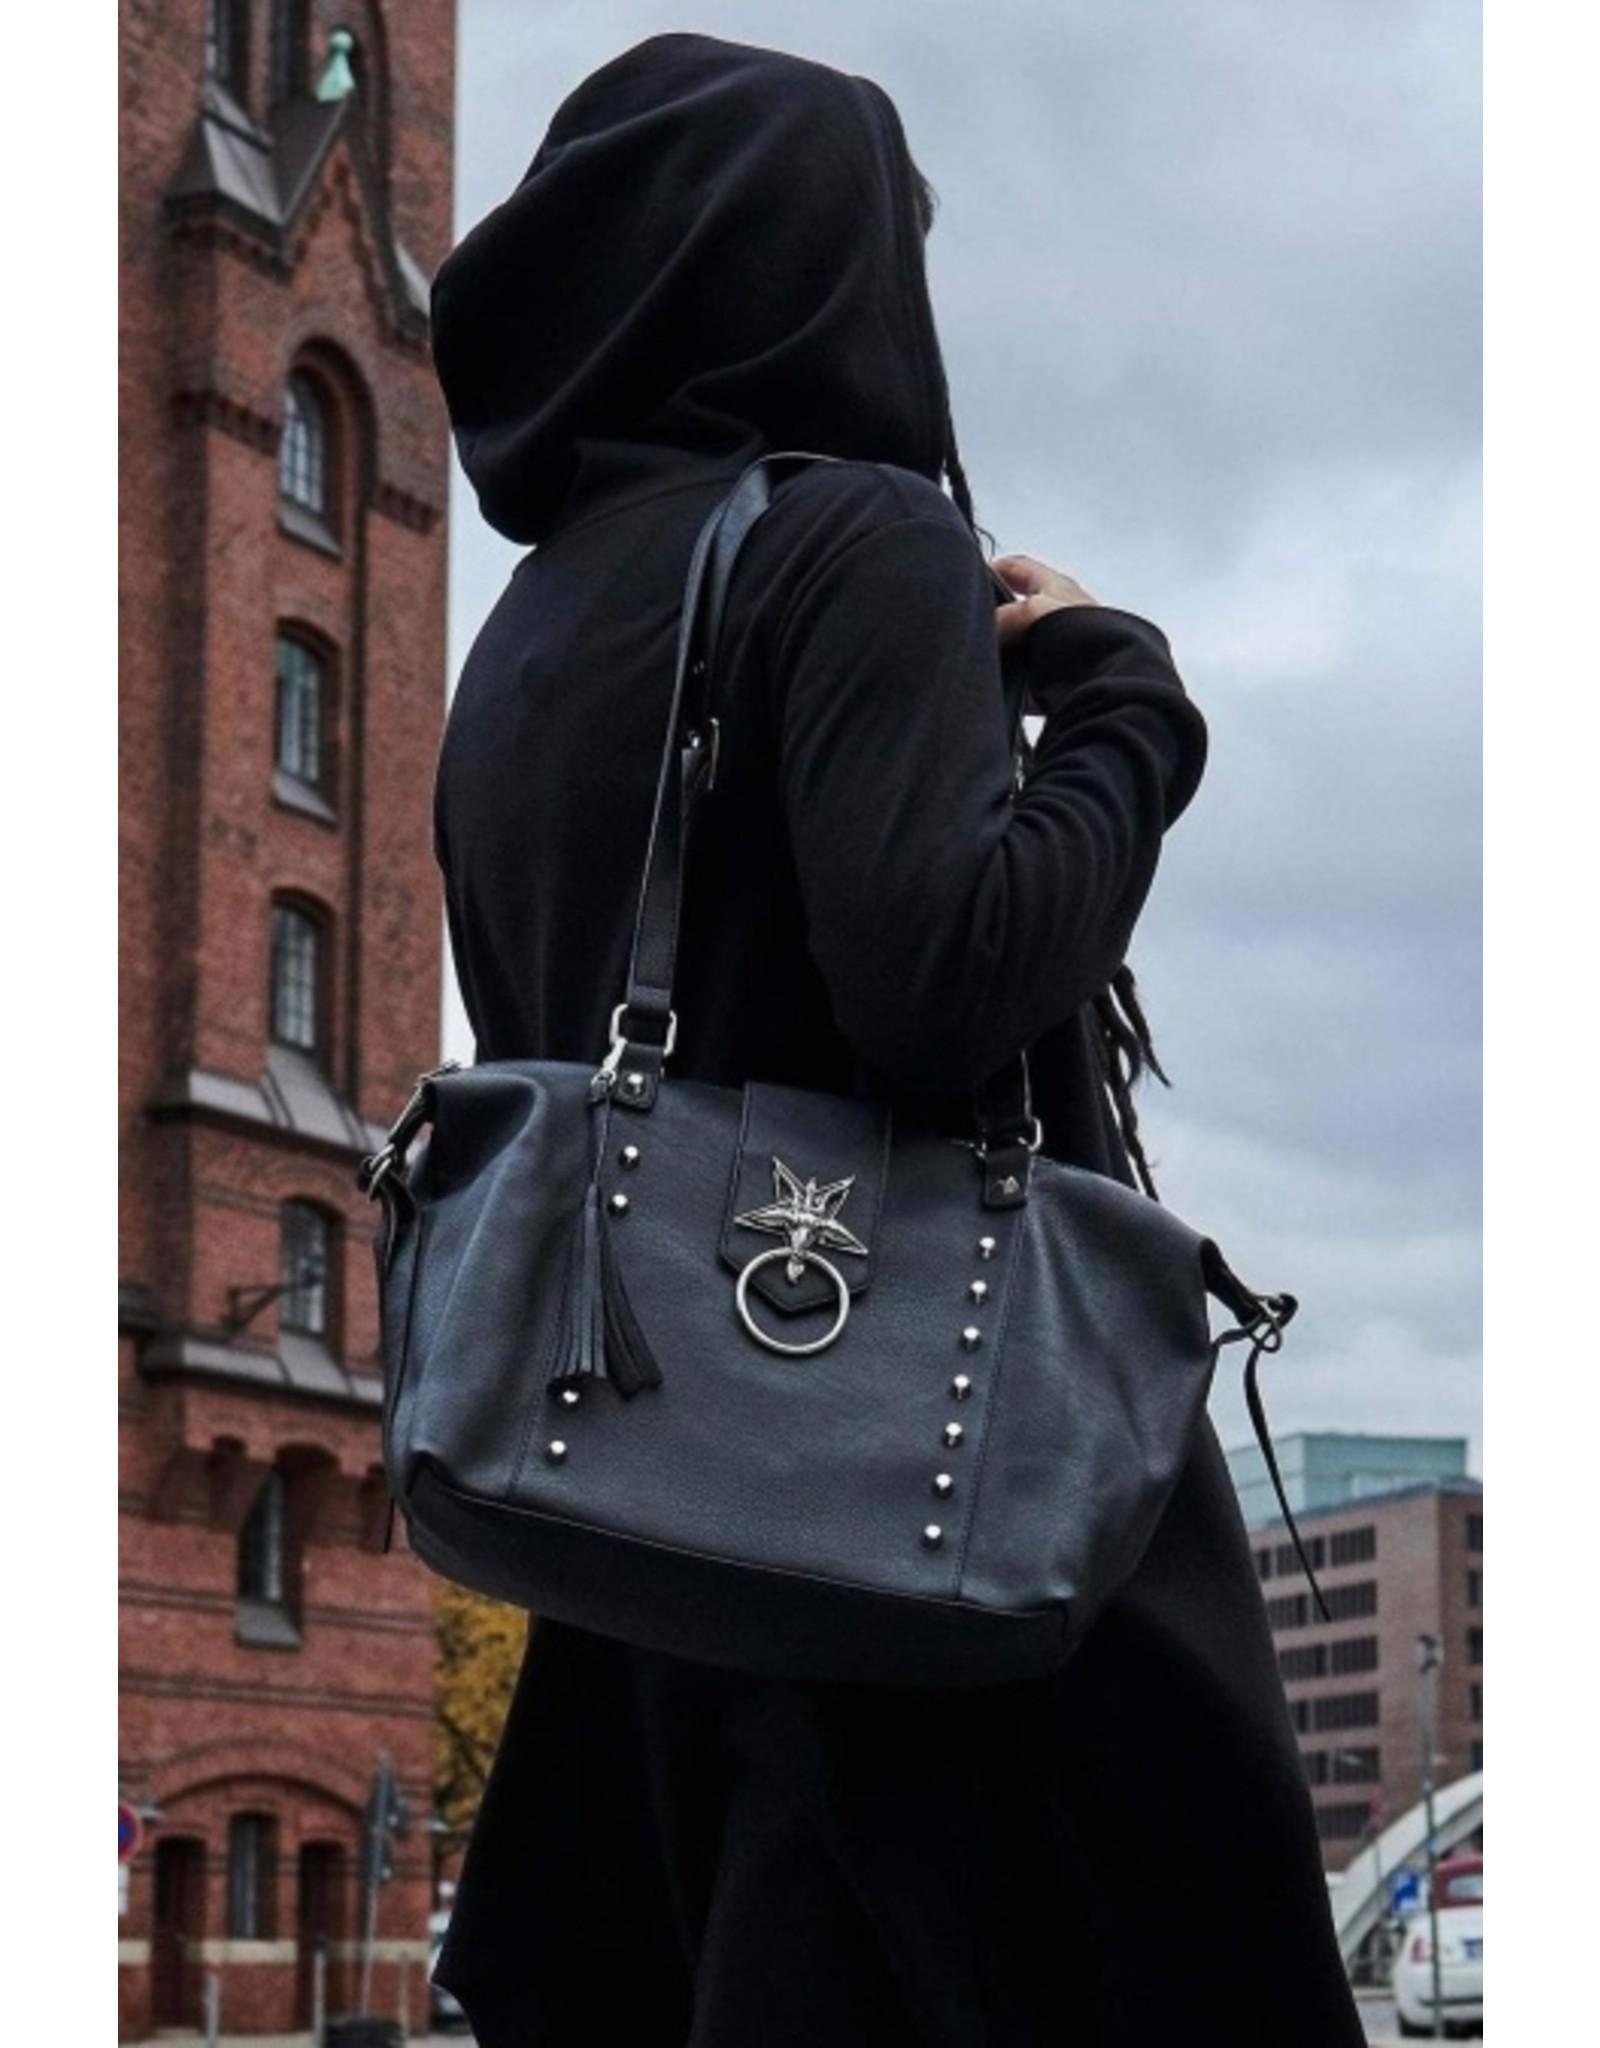 Killstar Killstar bags and accessories - Killstar Baphomet  totebag Brimstone